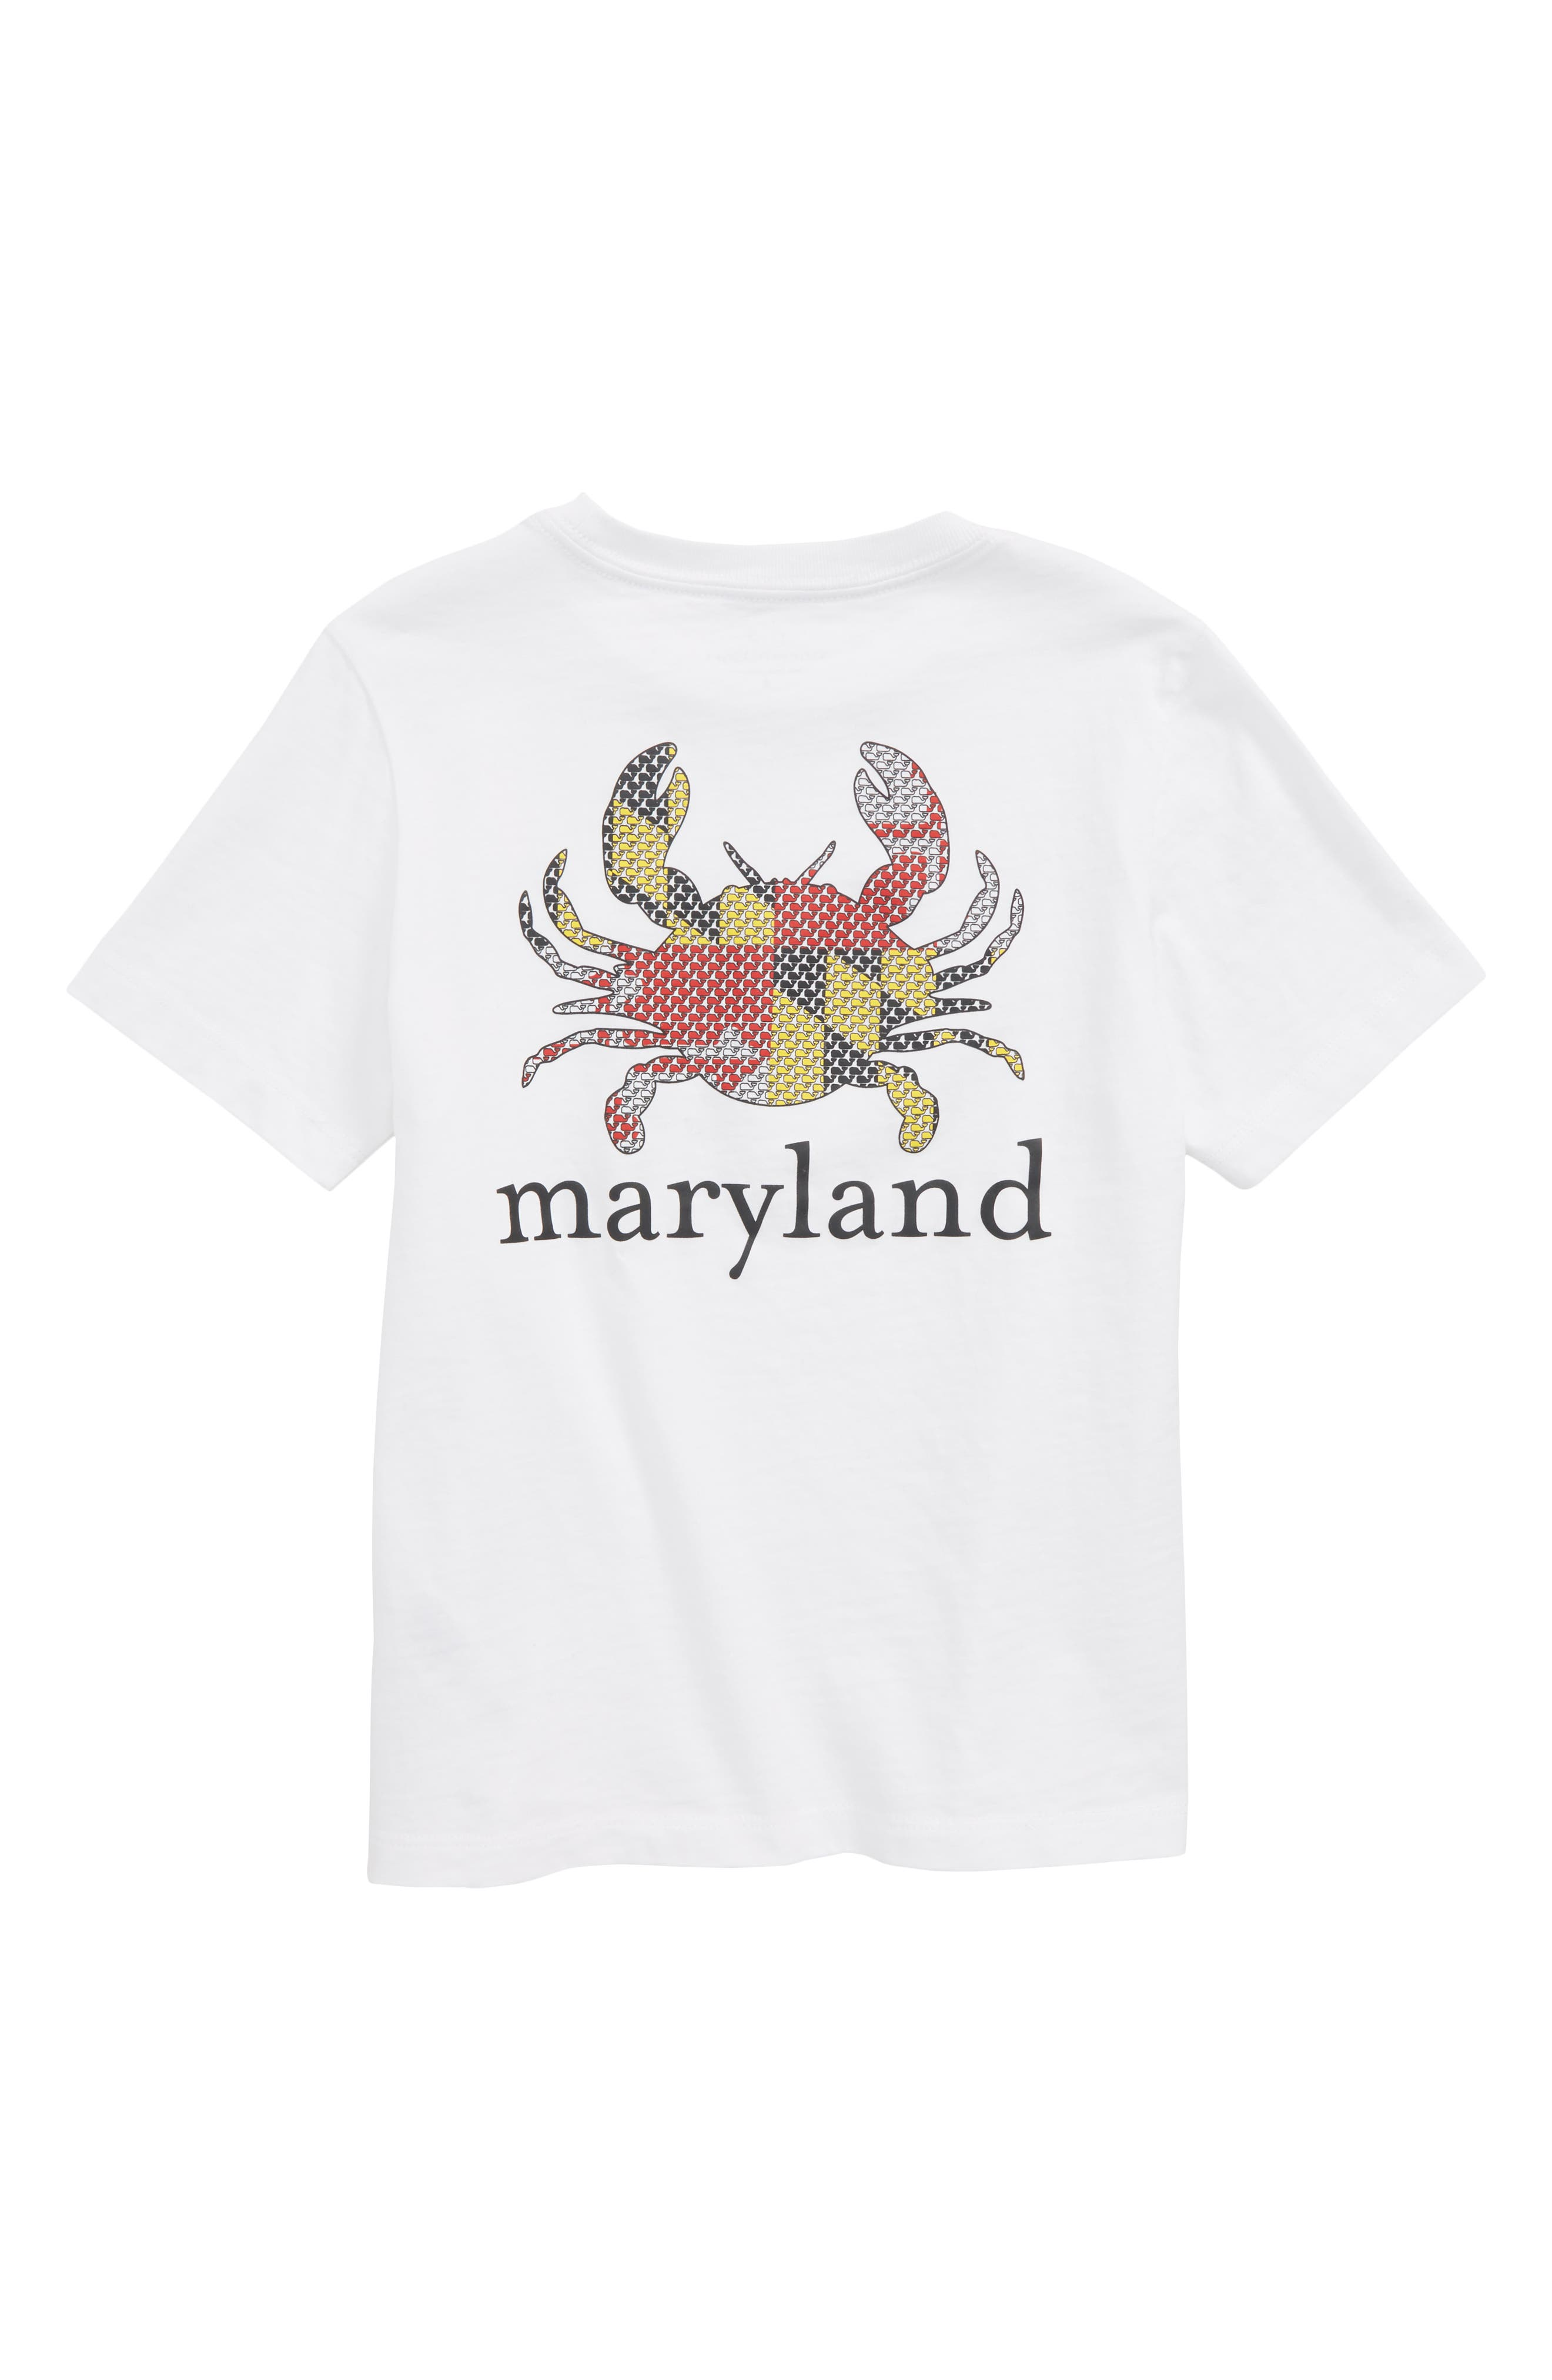 Maryland Crab Graphic Pocket T-Shirt,                             Alternate thumbnail 2, color,                             White Cap